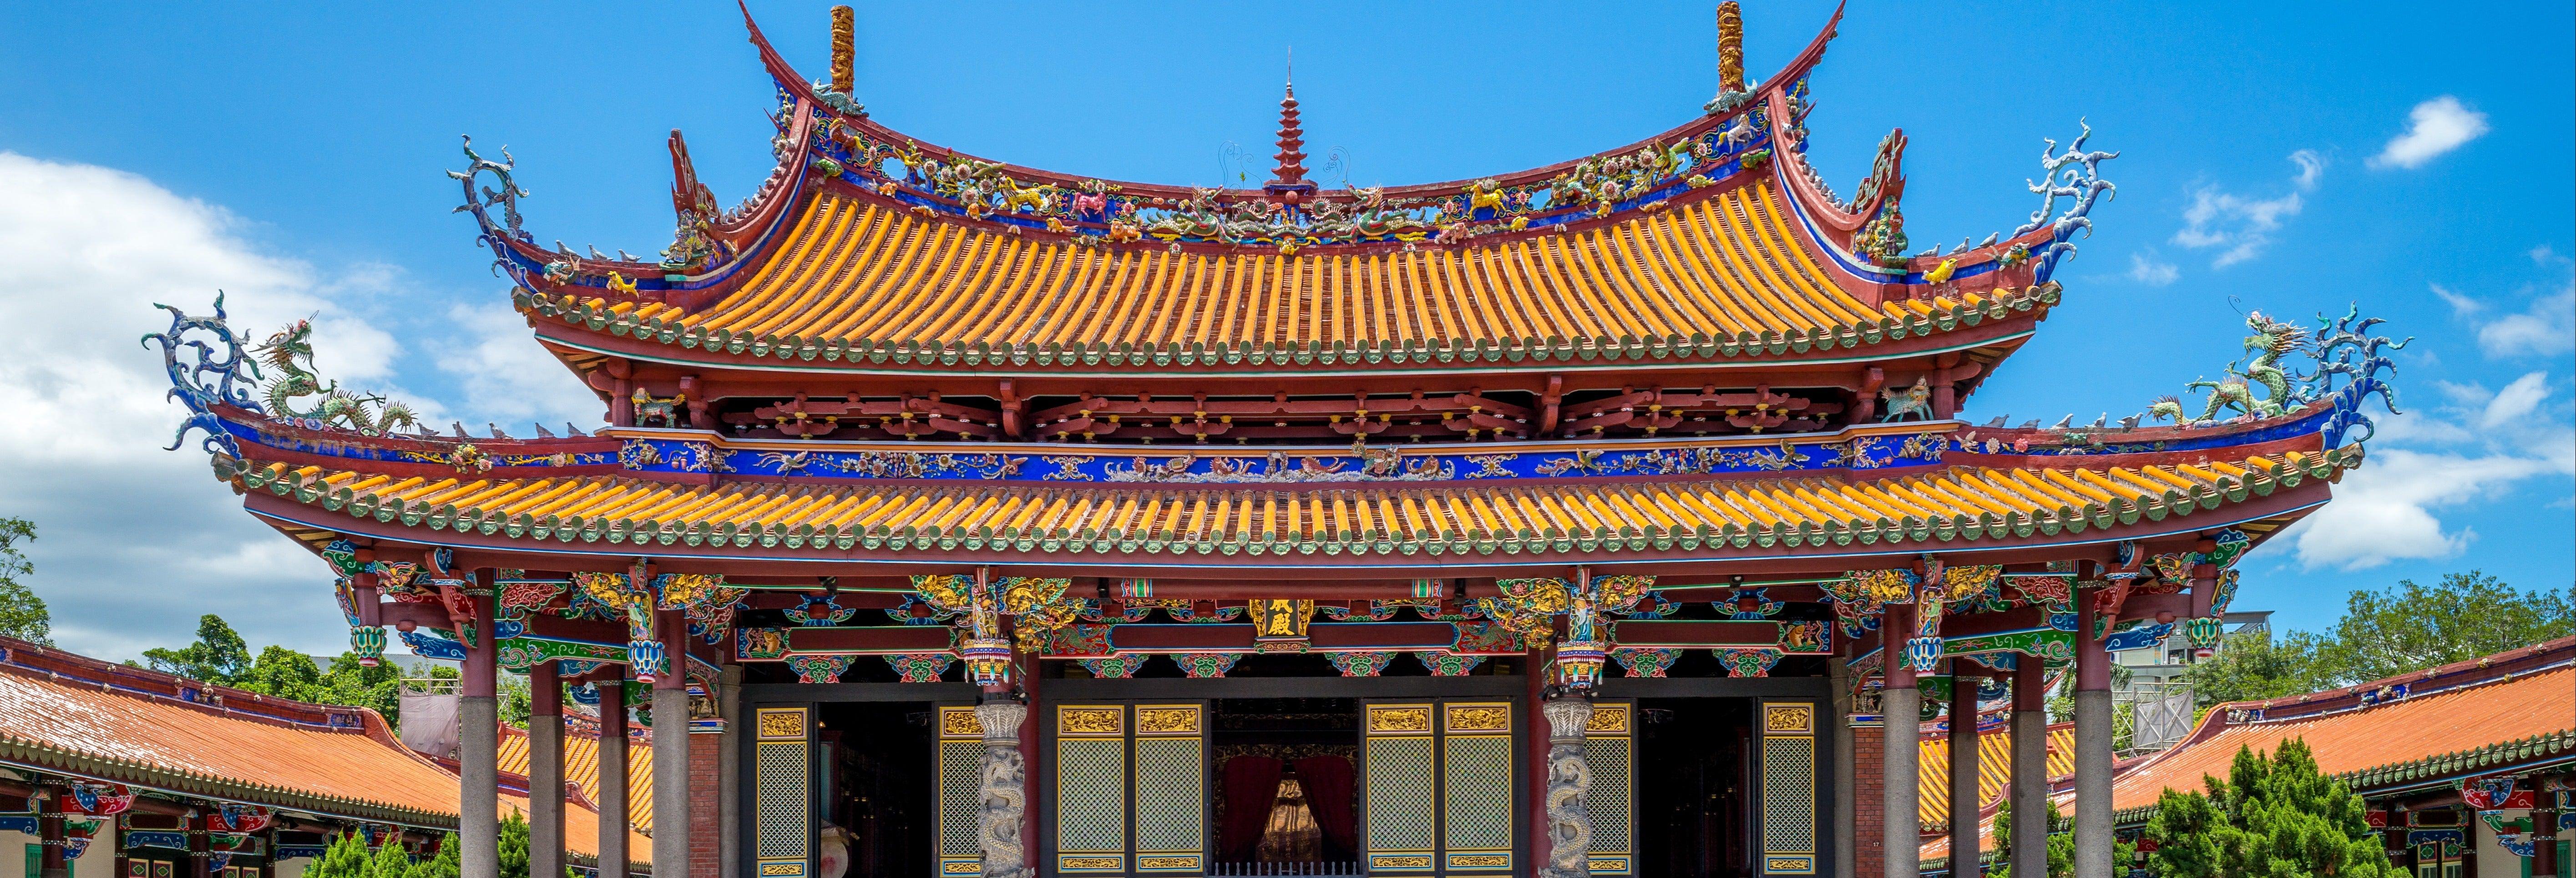 Temple de Confucius, Parc Beihai et Musée de la Capitale